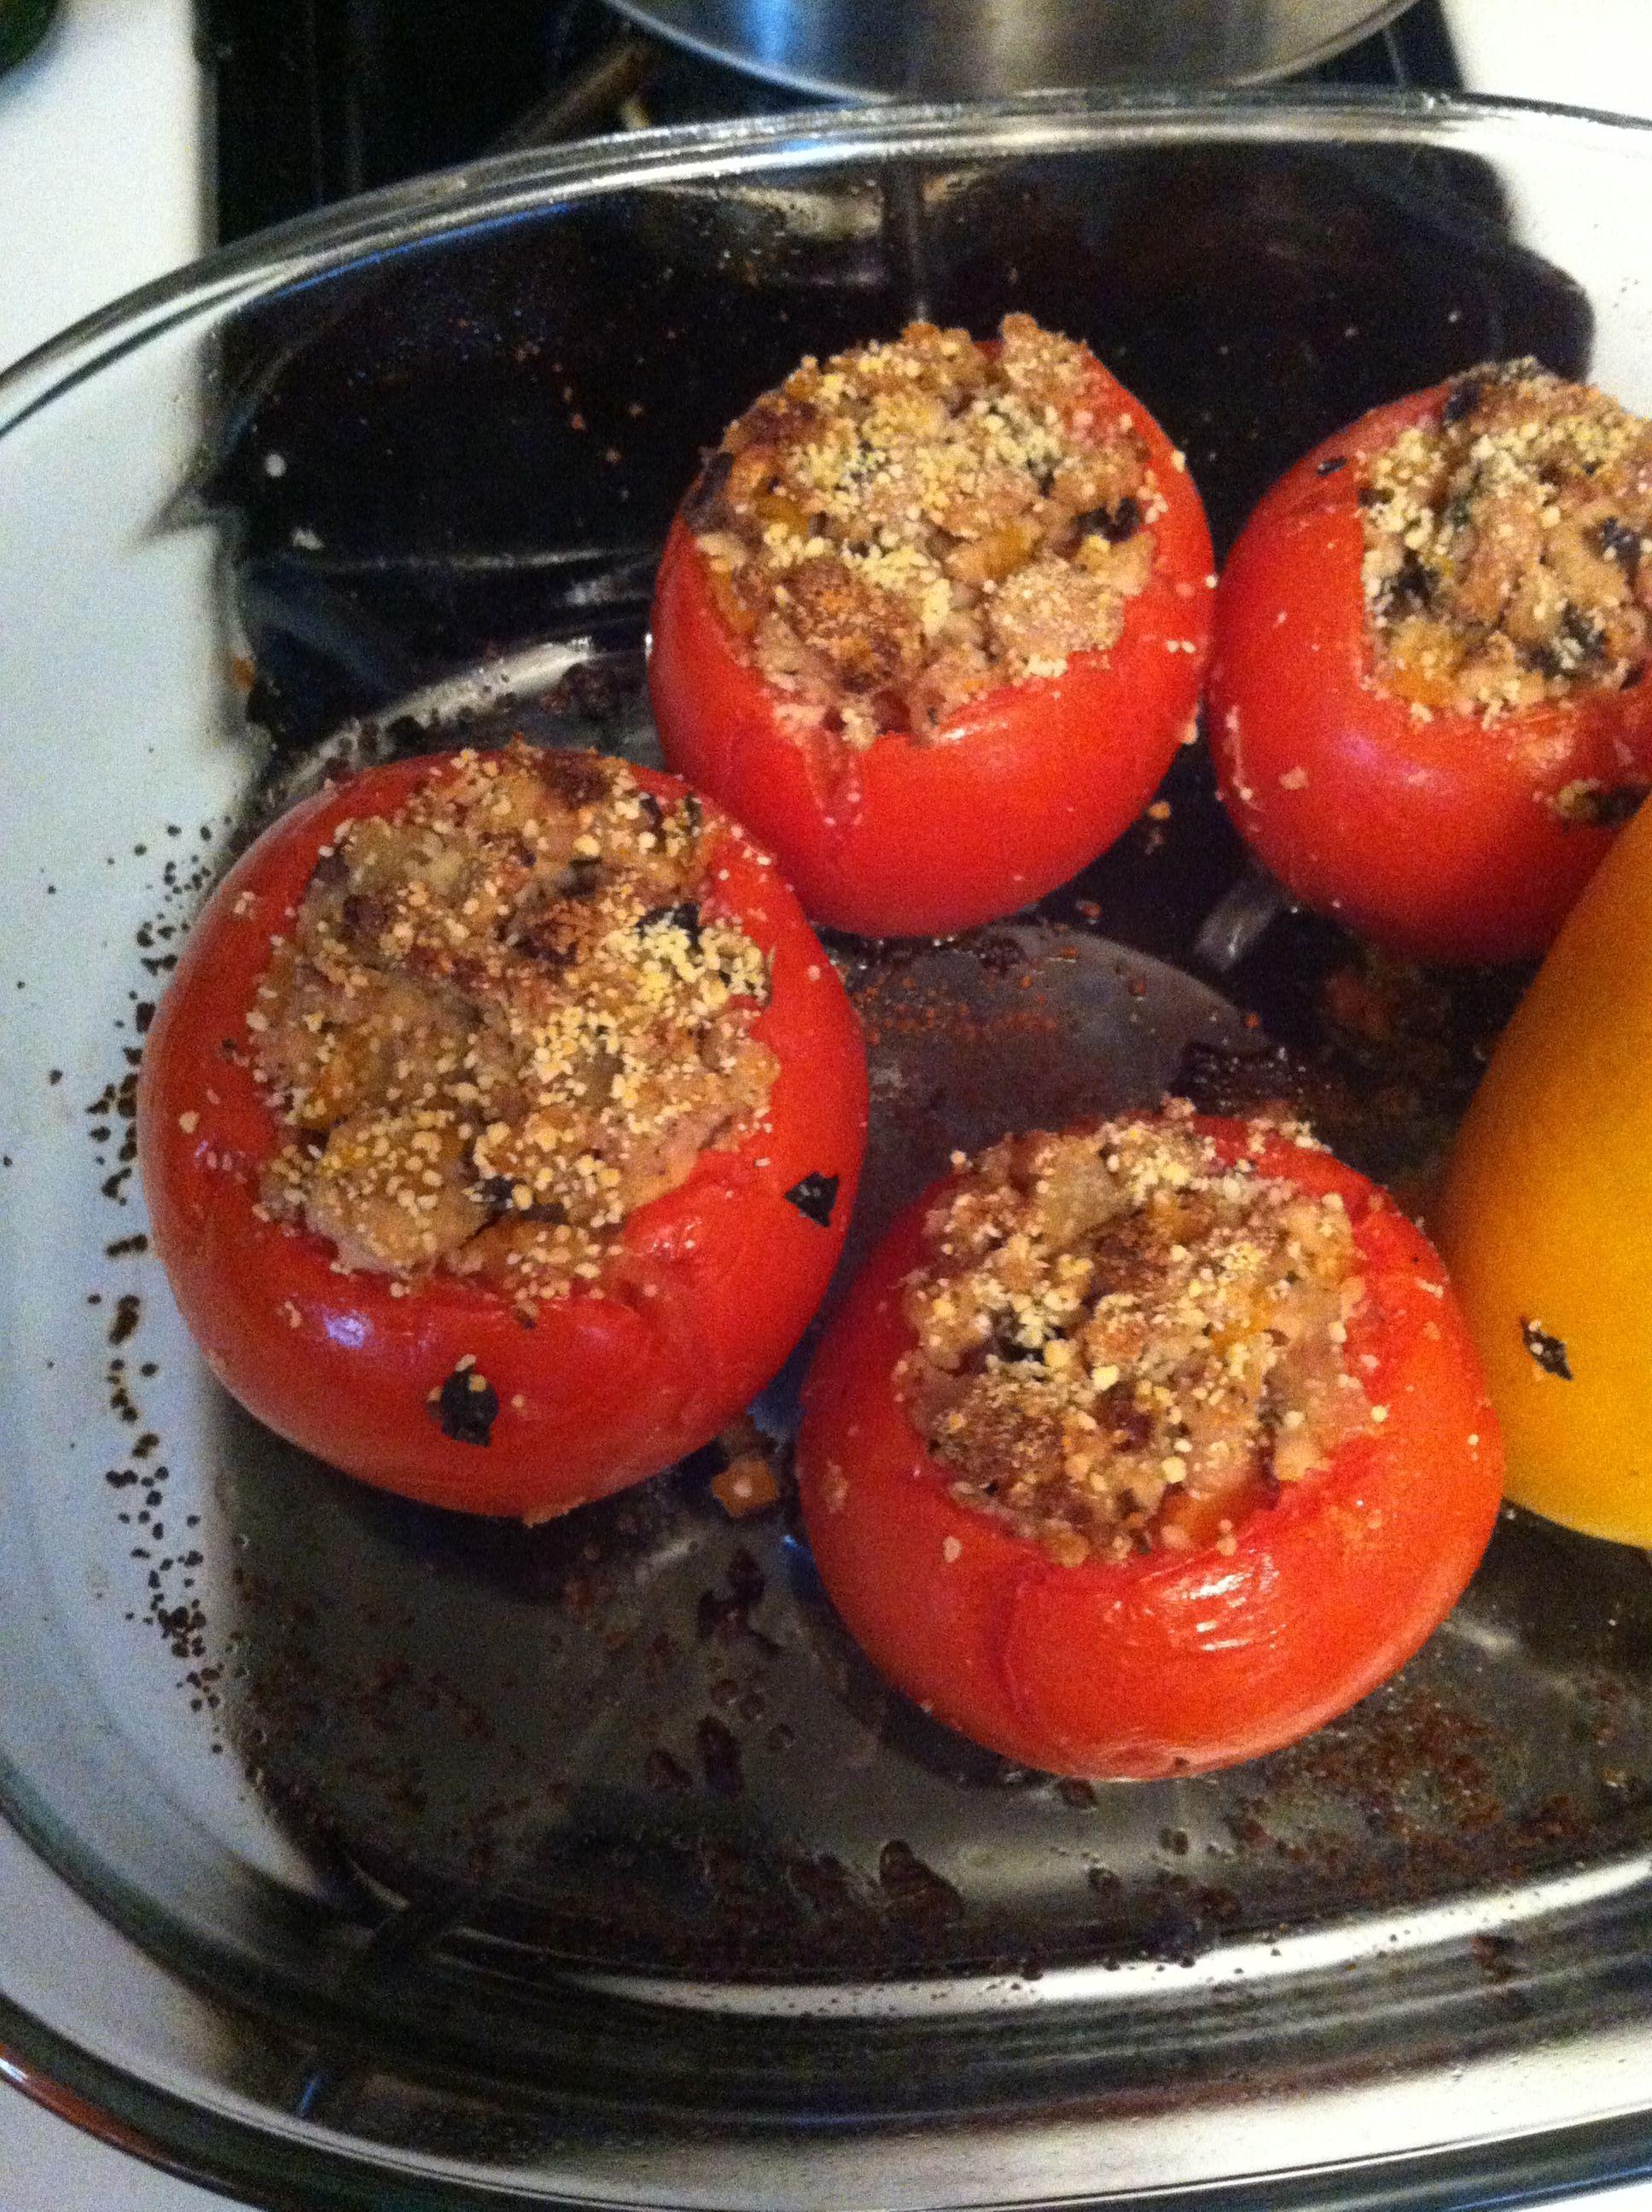 Italian sausage stuffed tomatoes